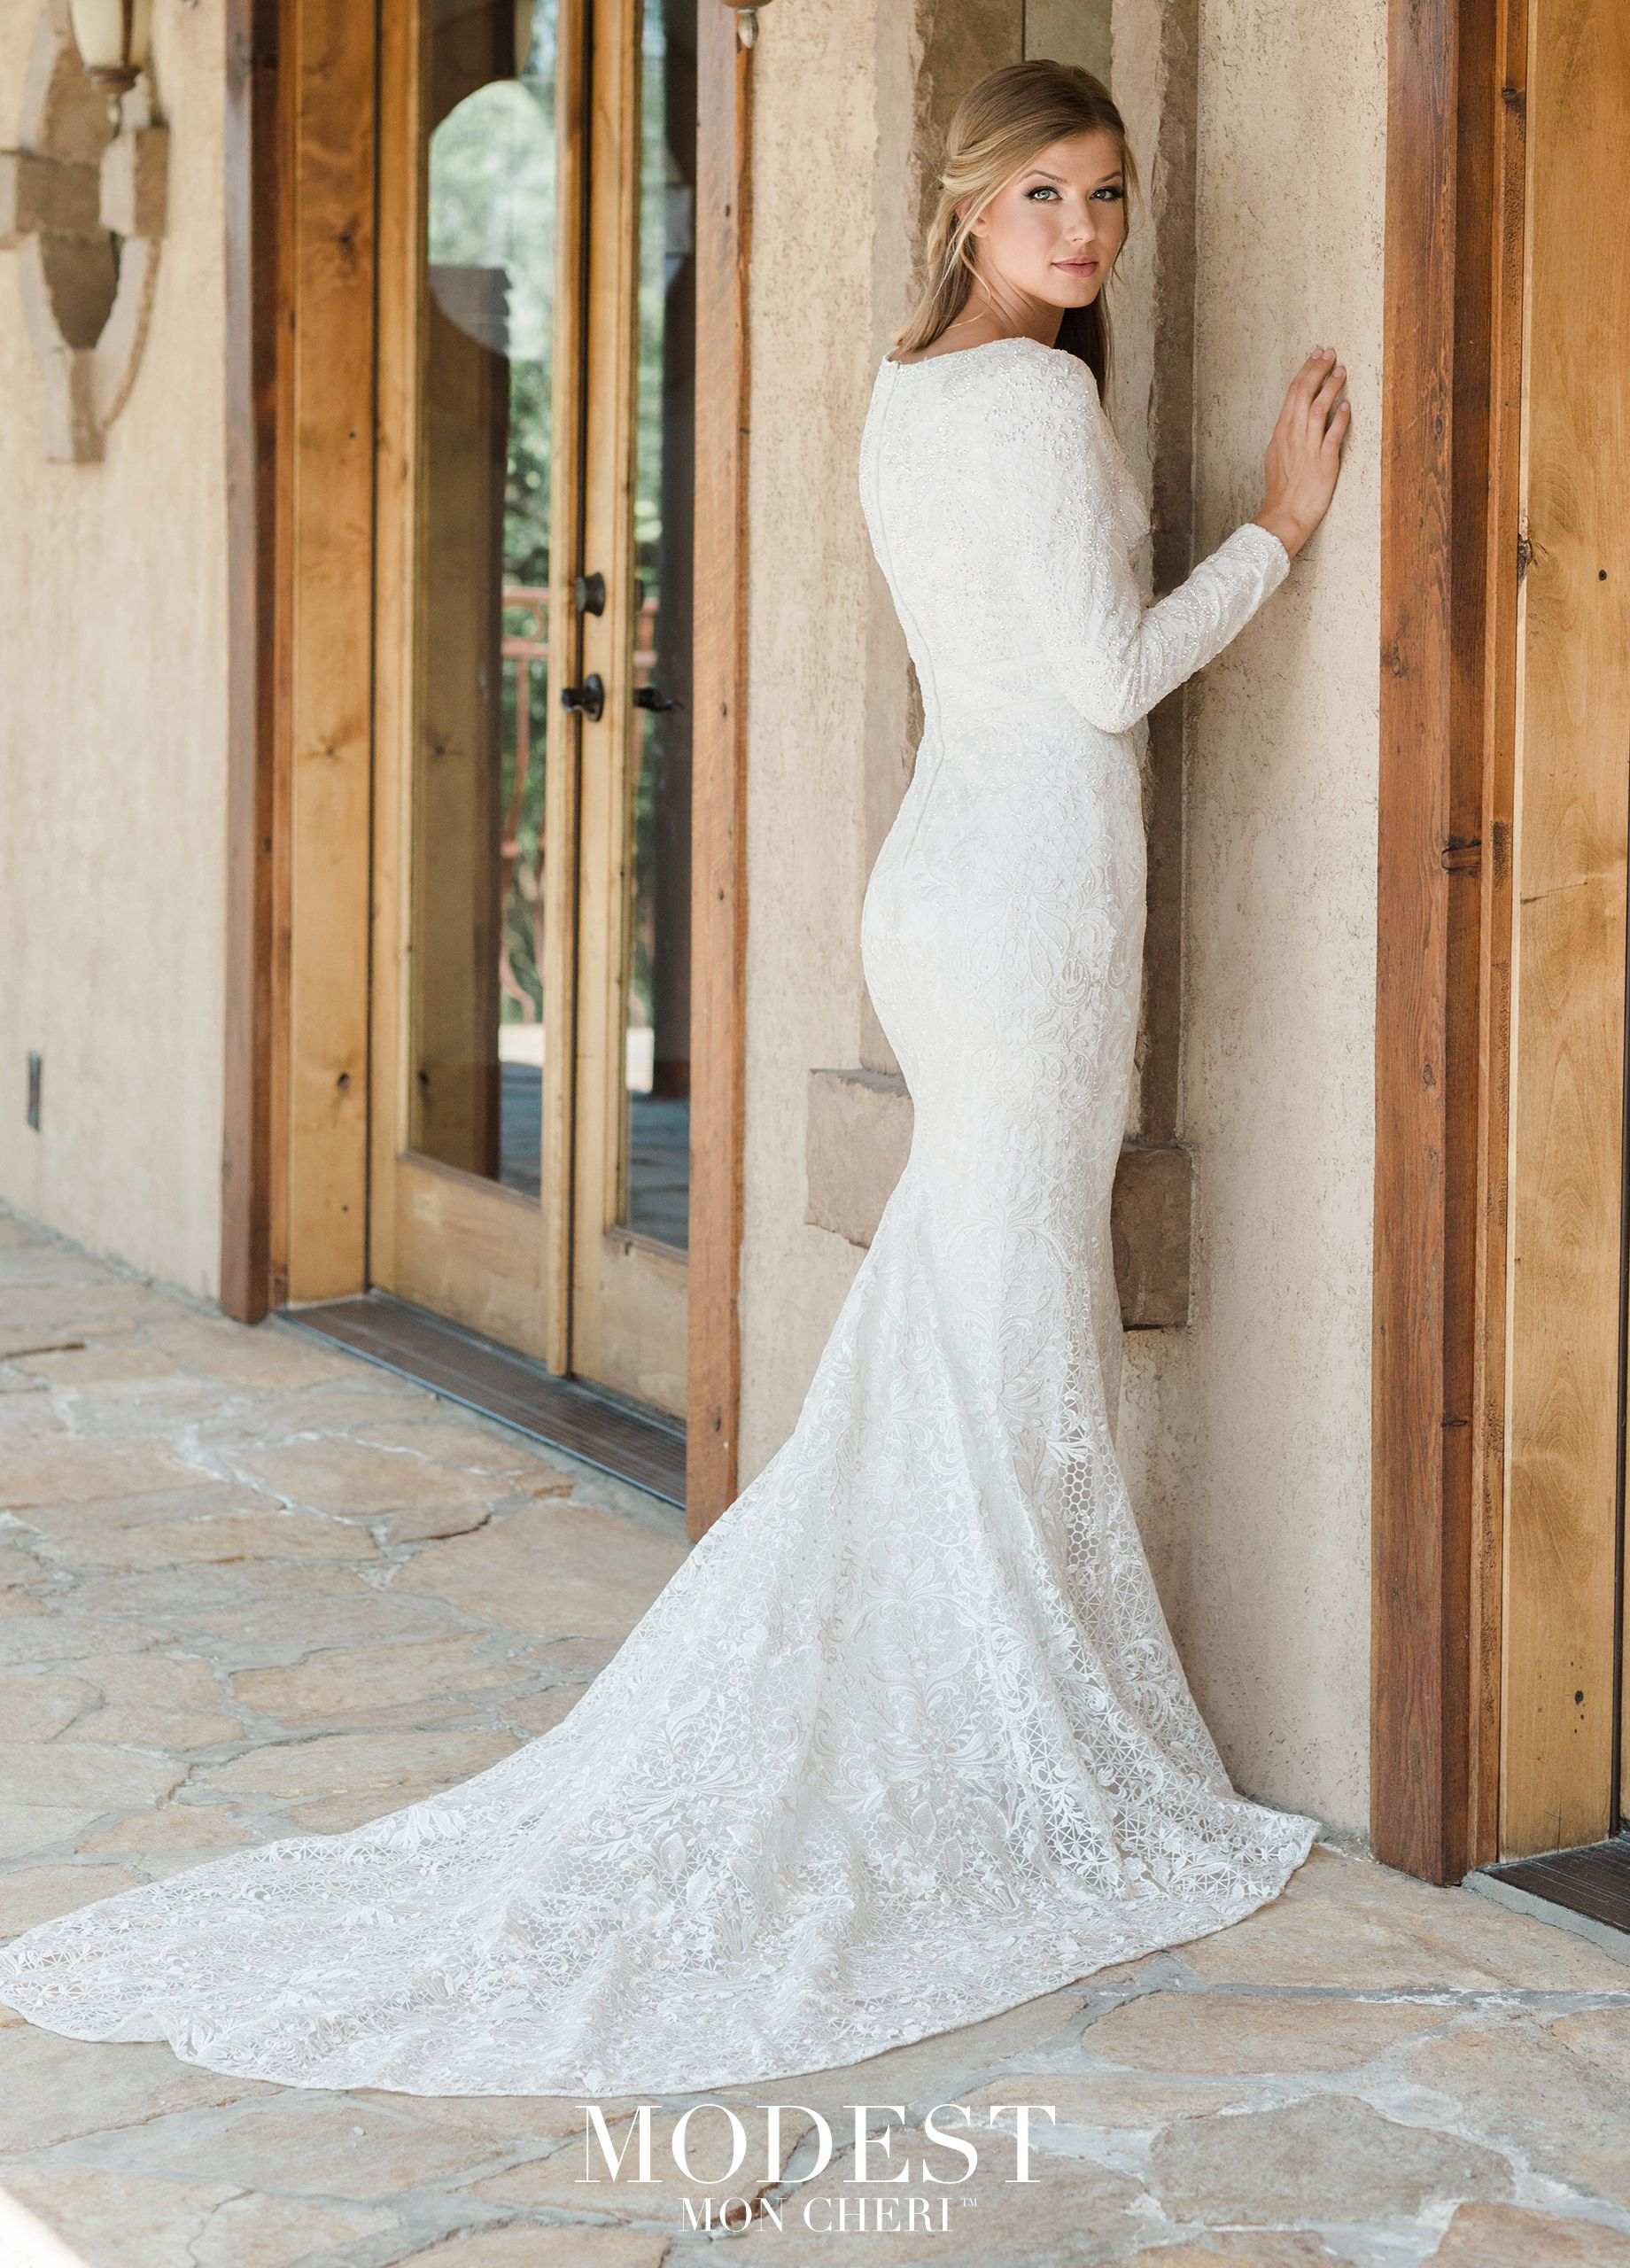 Modest By Mon Cheri Tr11987 Mon Cheri Bridals Modest Wedding Dresses Petite Wedding Dress Fitted Wedding Dress [ 2560 x 1840 Pixel ]